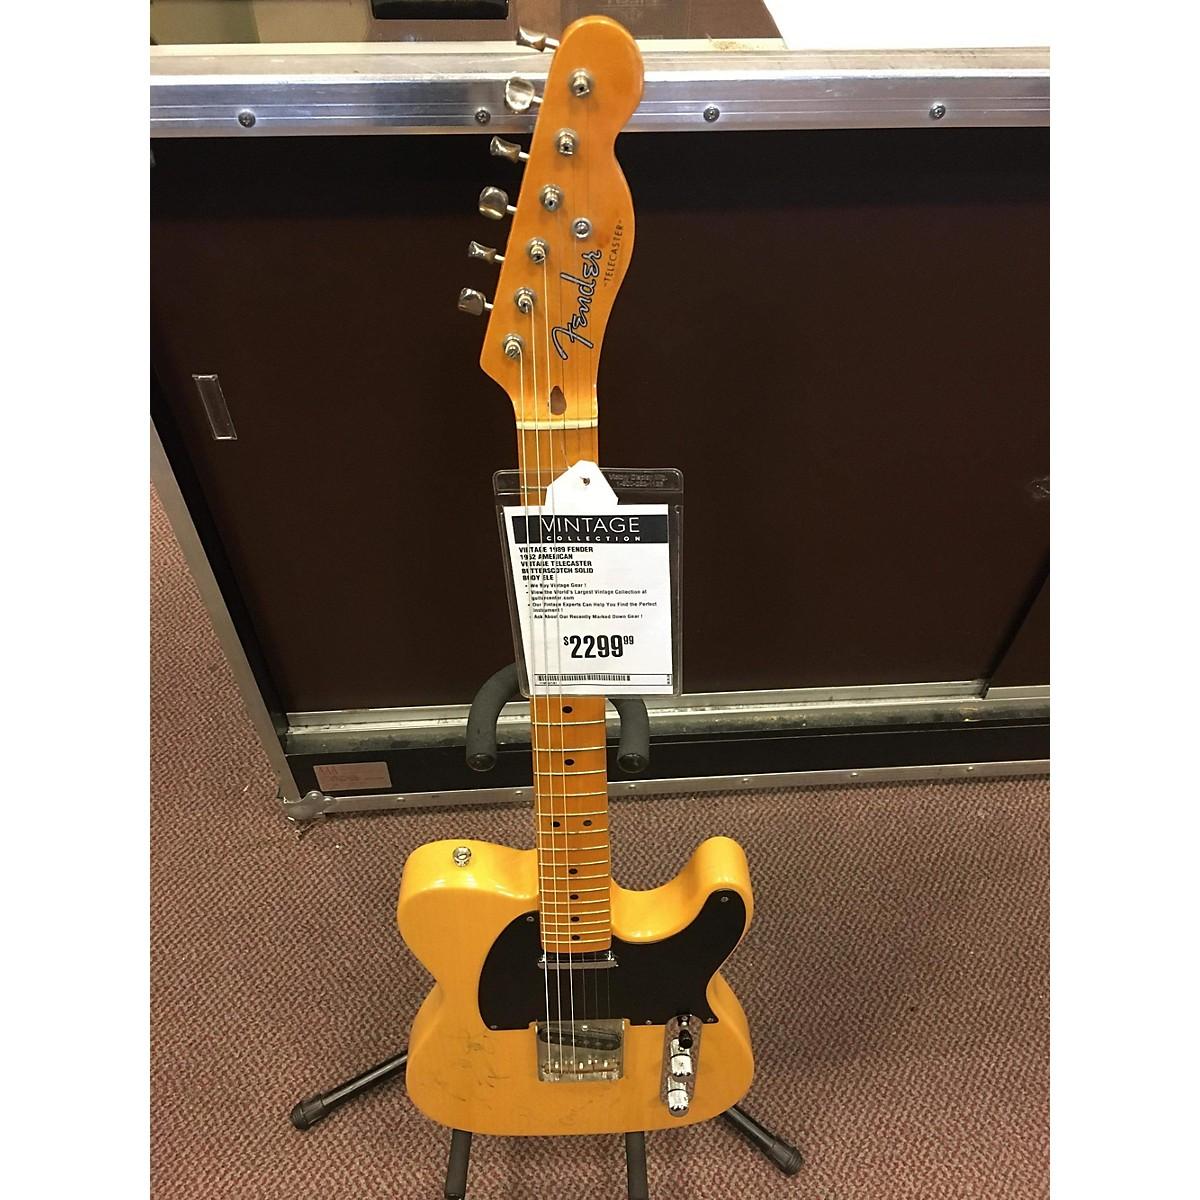 Fender 1989 1952 American Vintage Telecaster Solid Body Electric Guitar